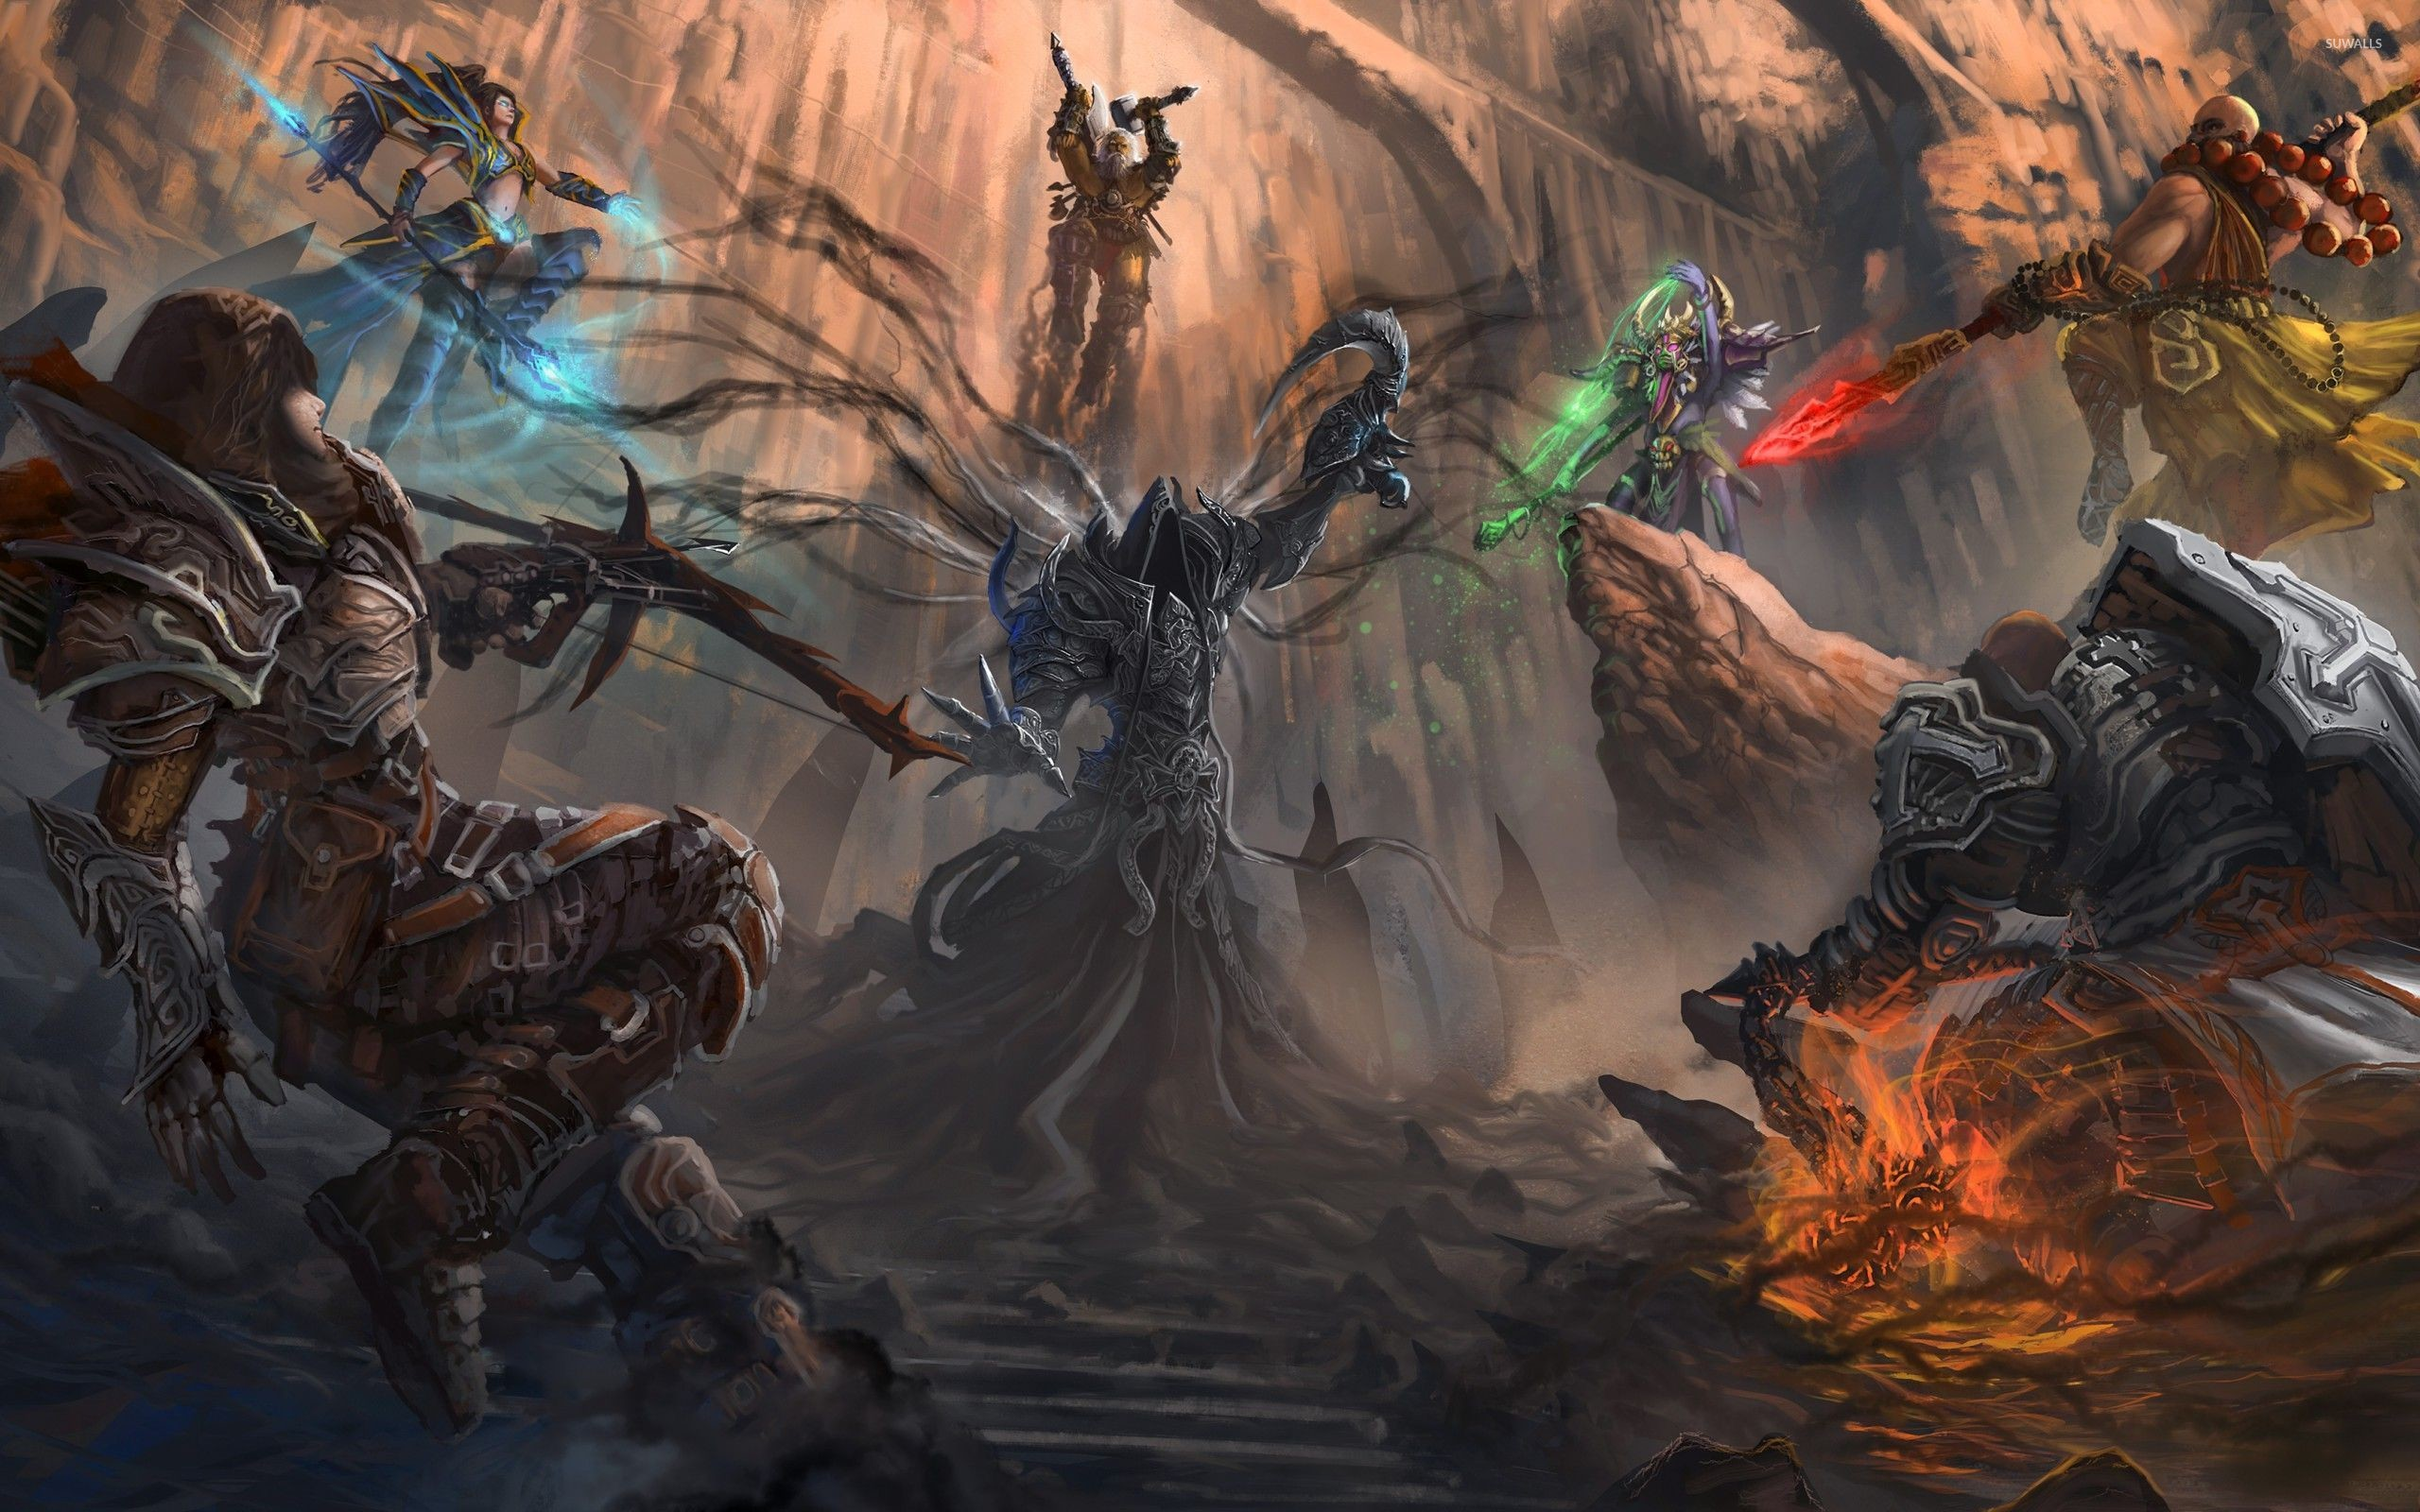 Heroes in Diablo III wallpaper